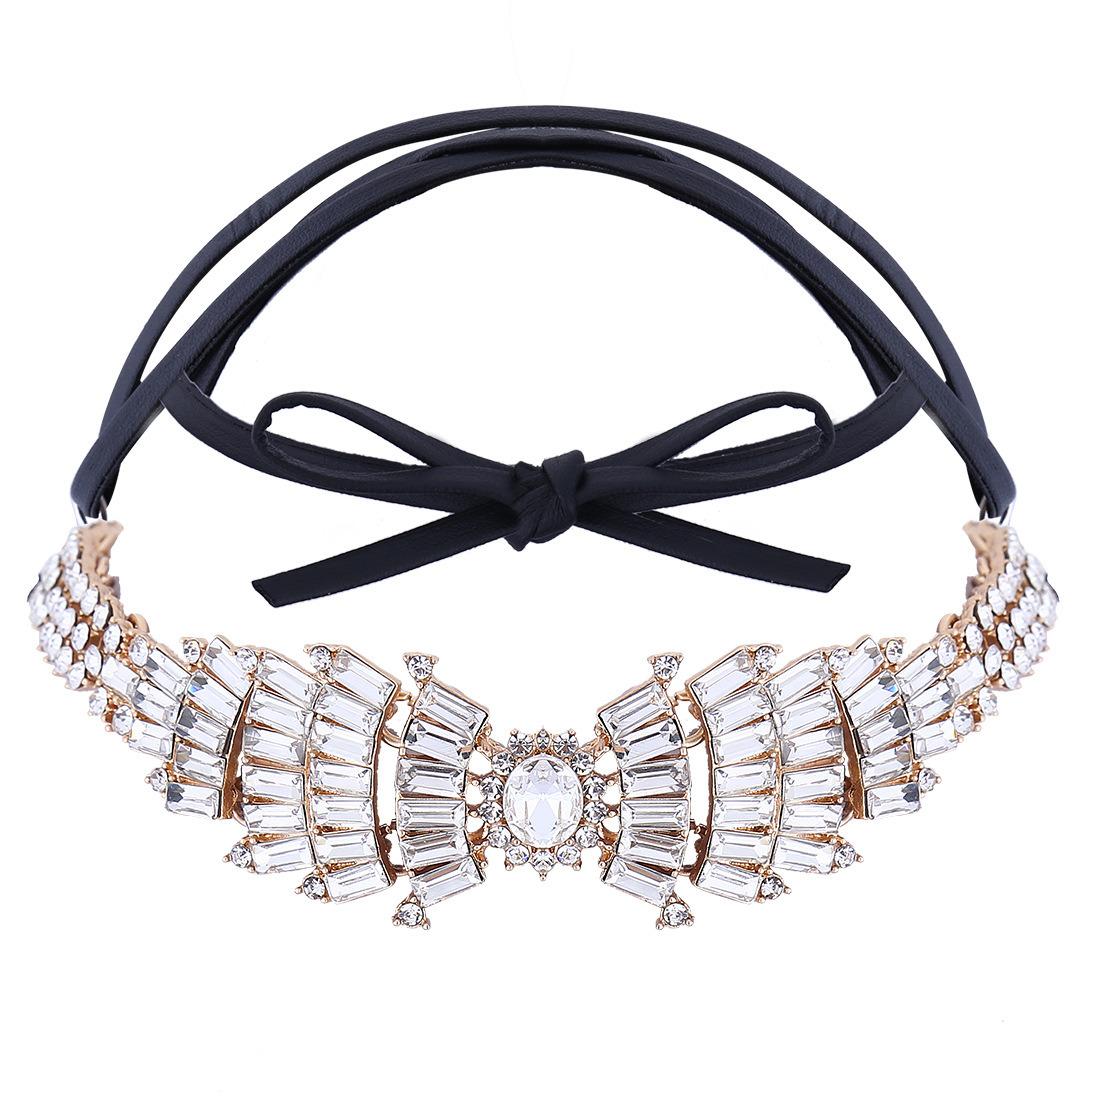 Fashion PU Leather Full Rhinestone Bow Wings Diamond Collar Choker Necklace Jewelry